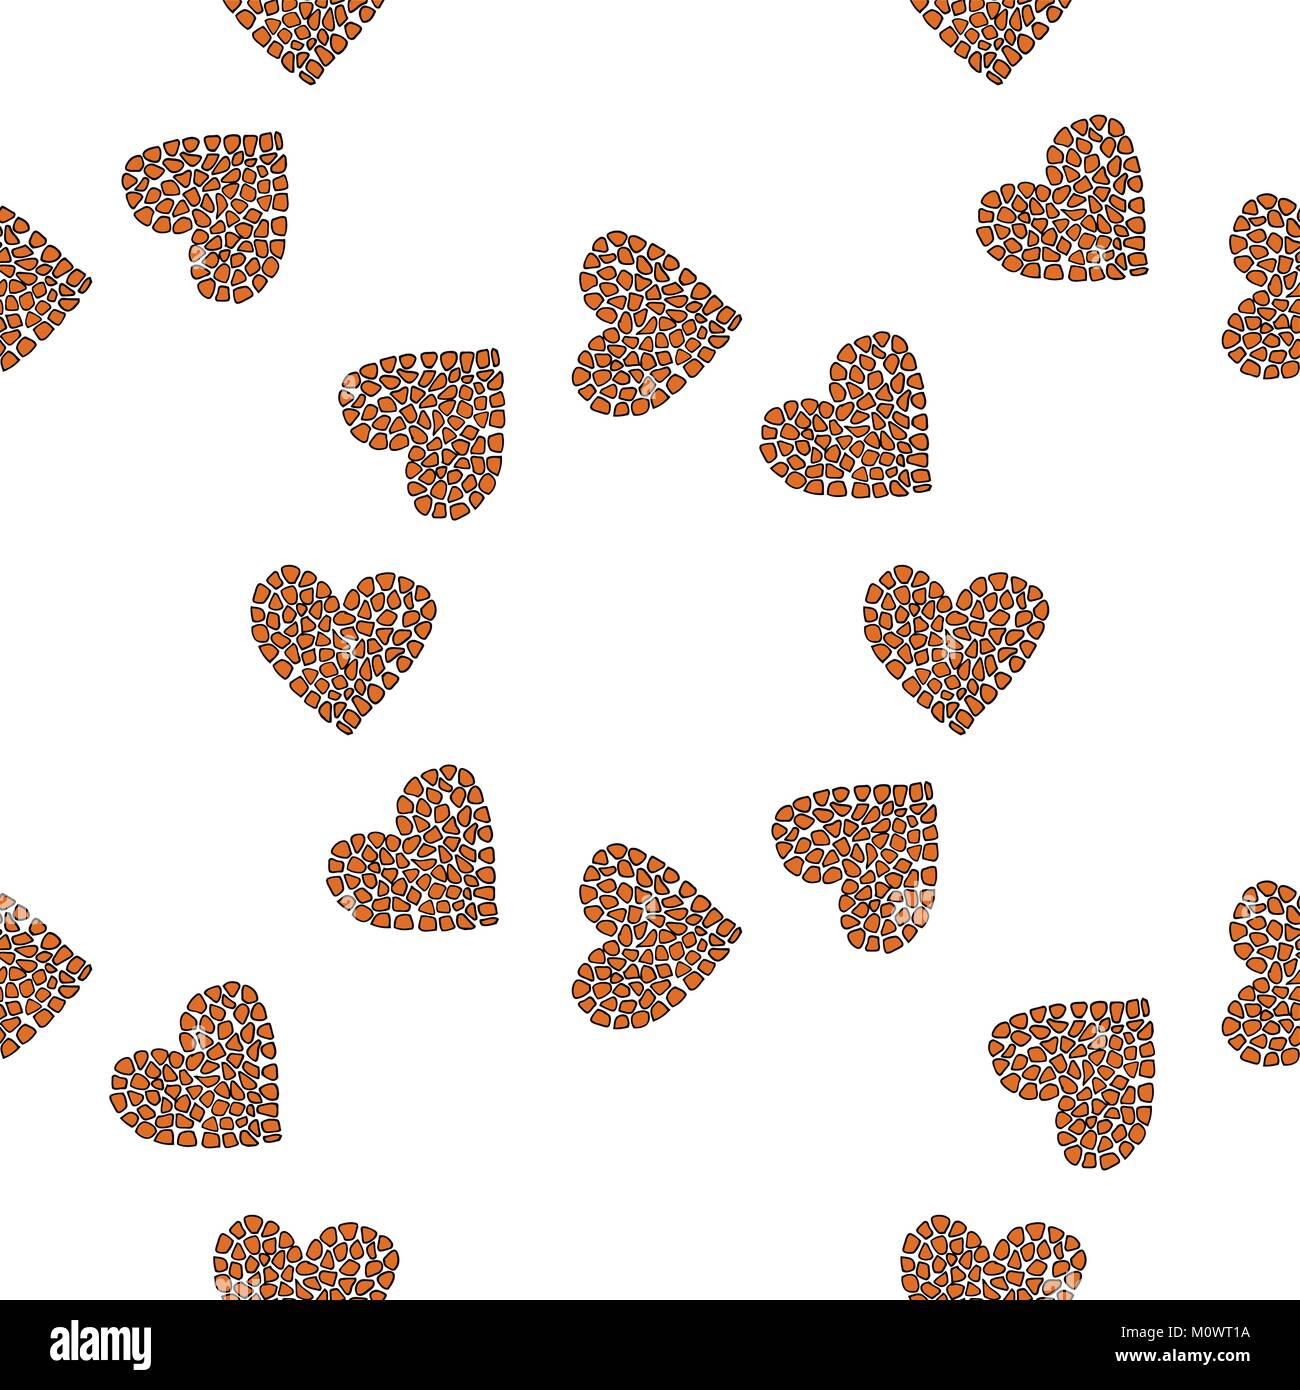 Seamless pattern background heart - Stock Image